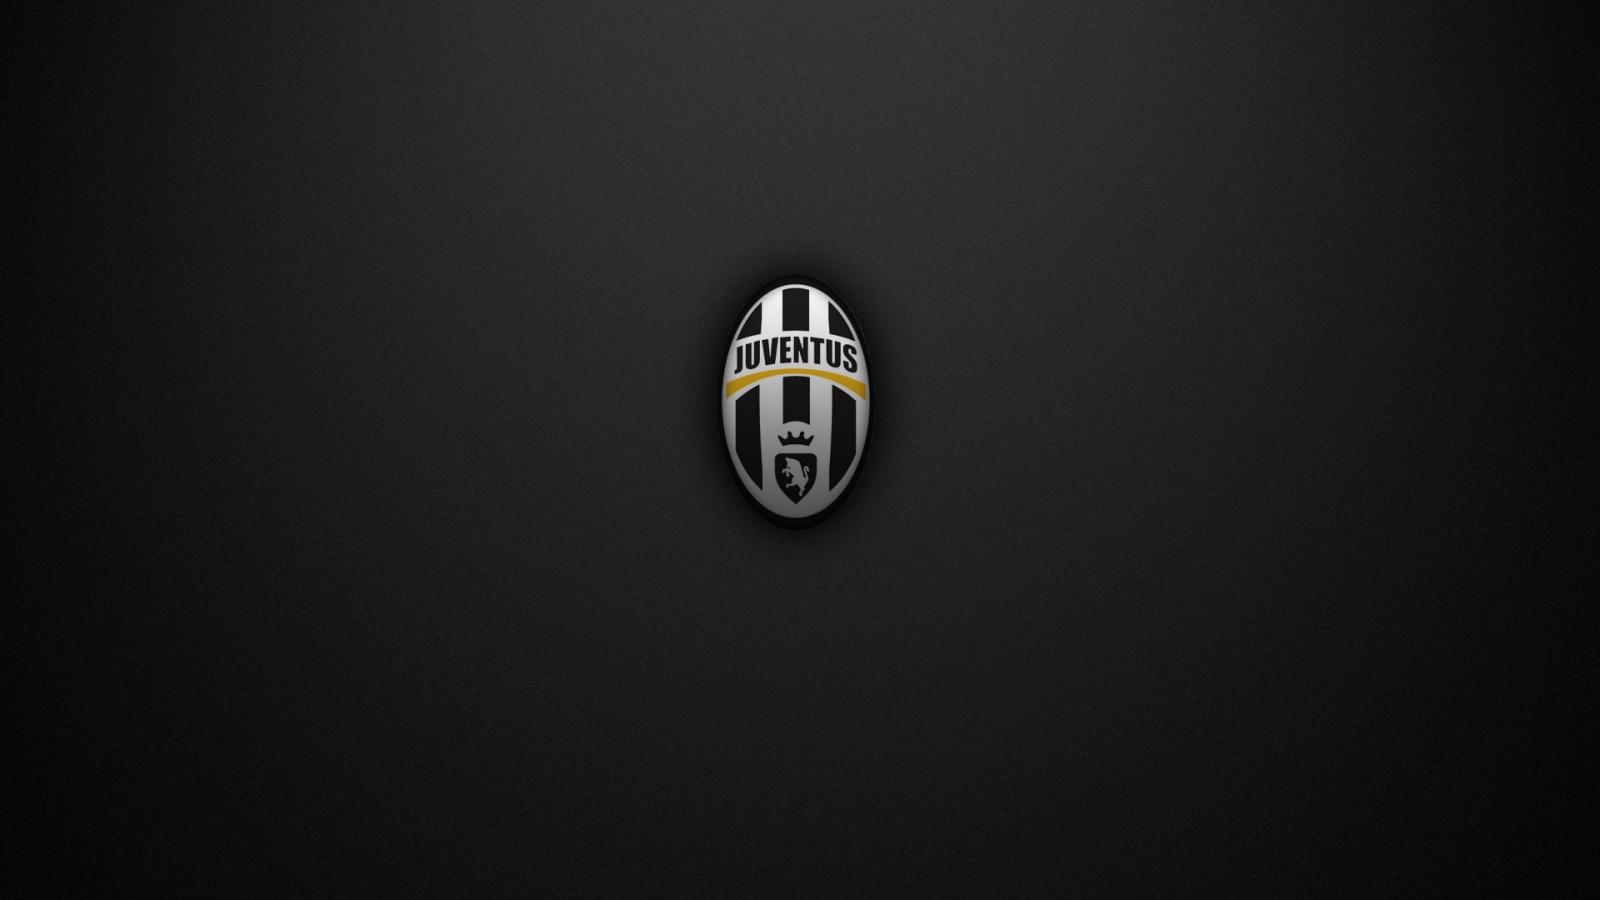 juventus the white blacks super logo black background